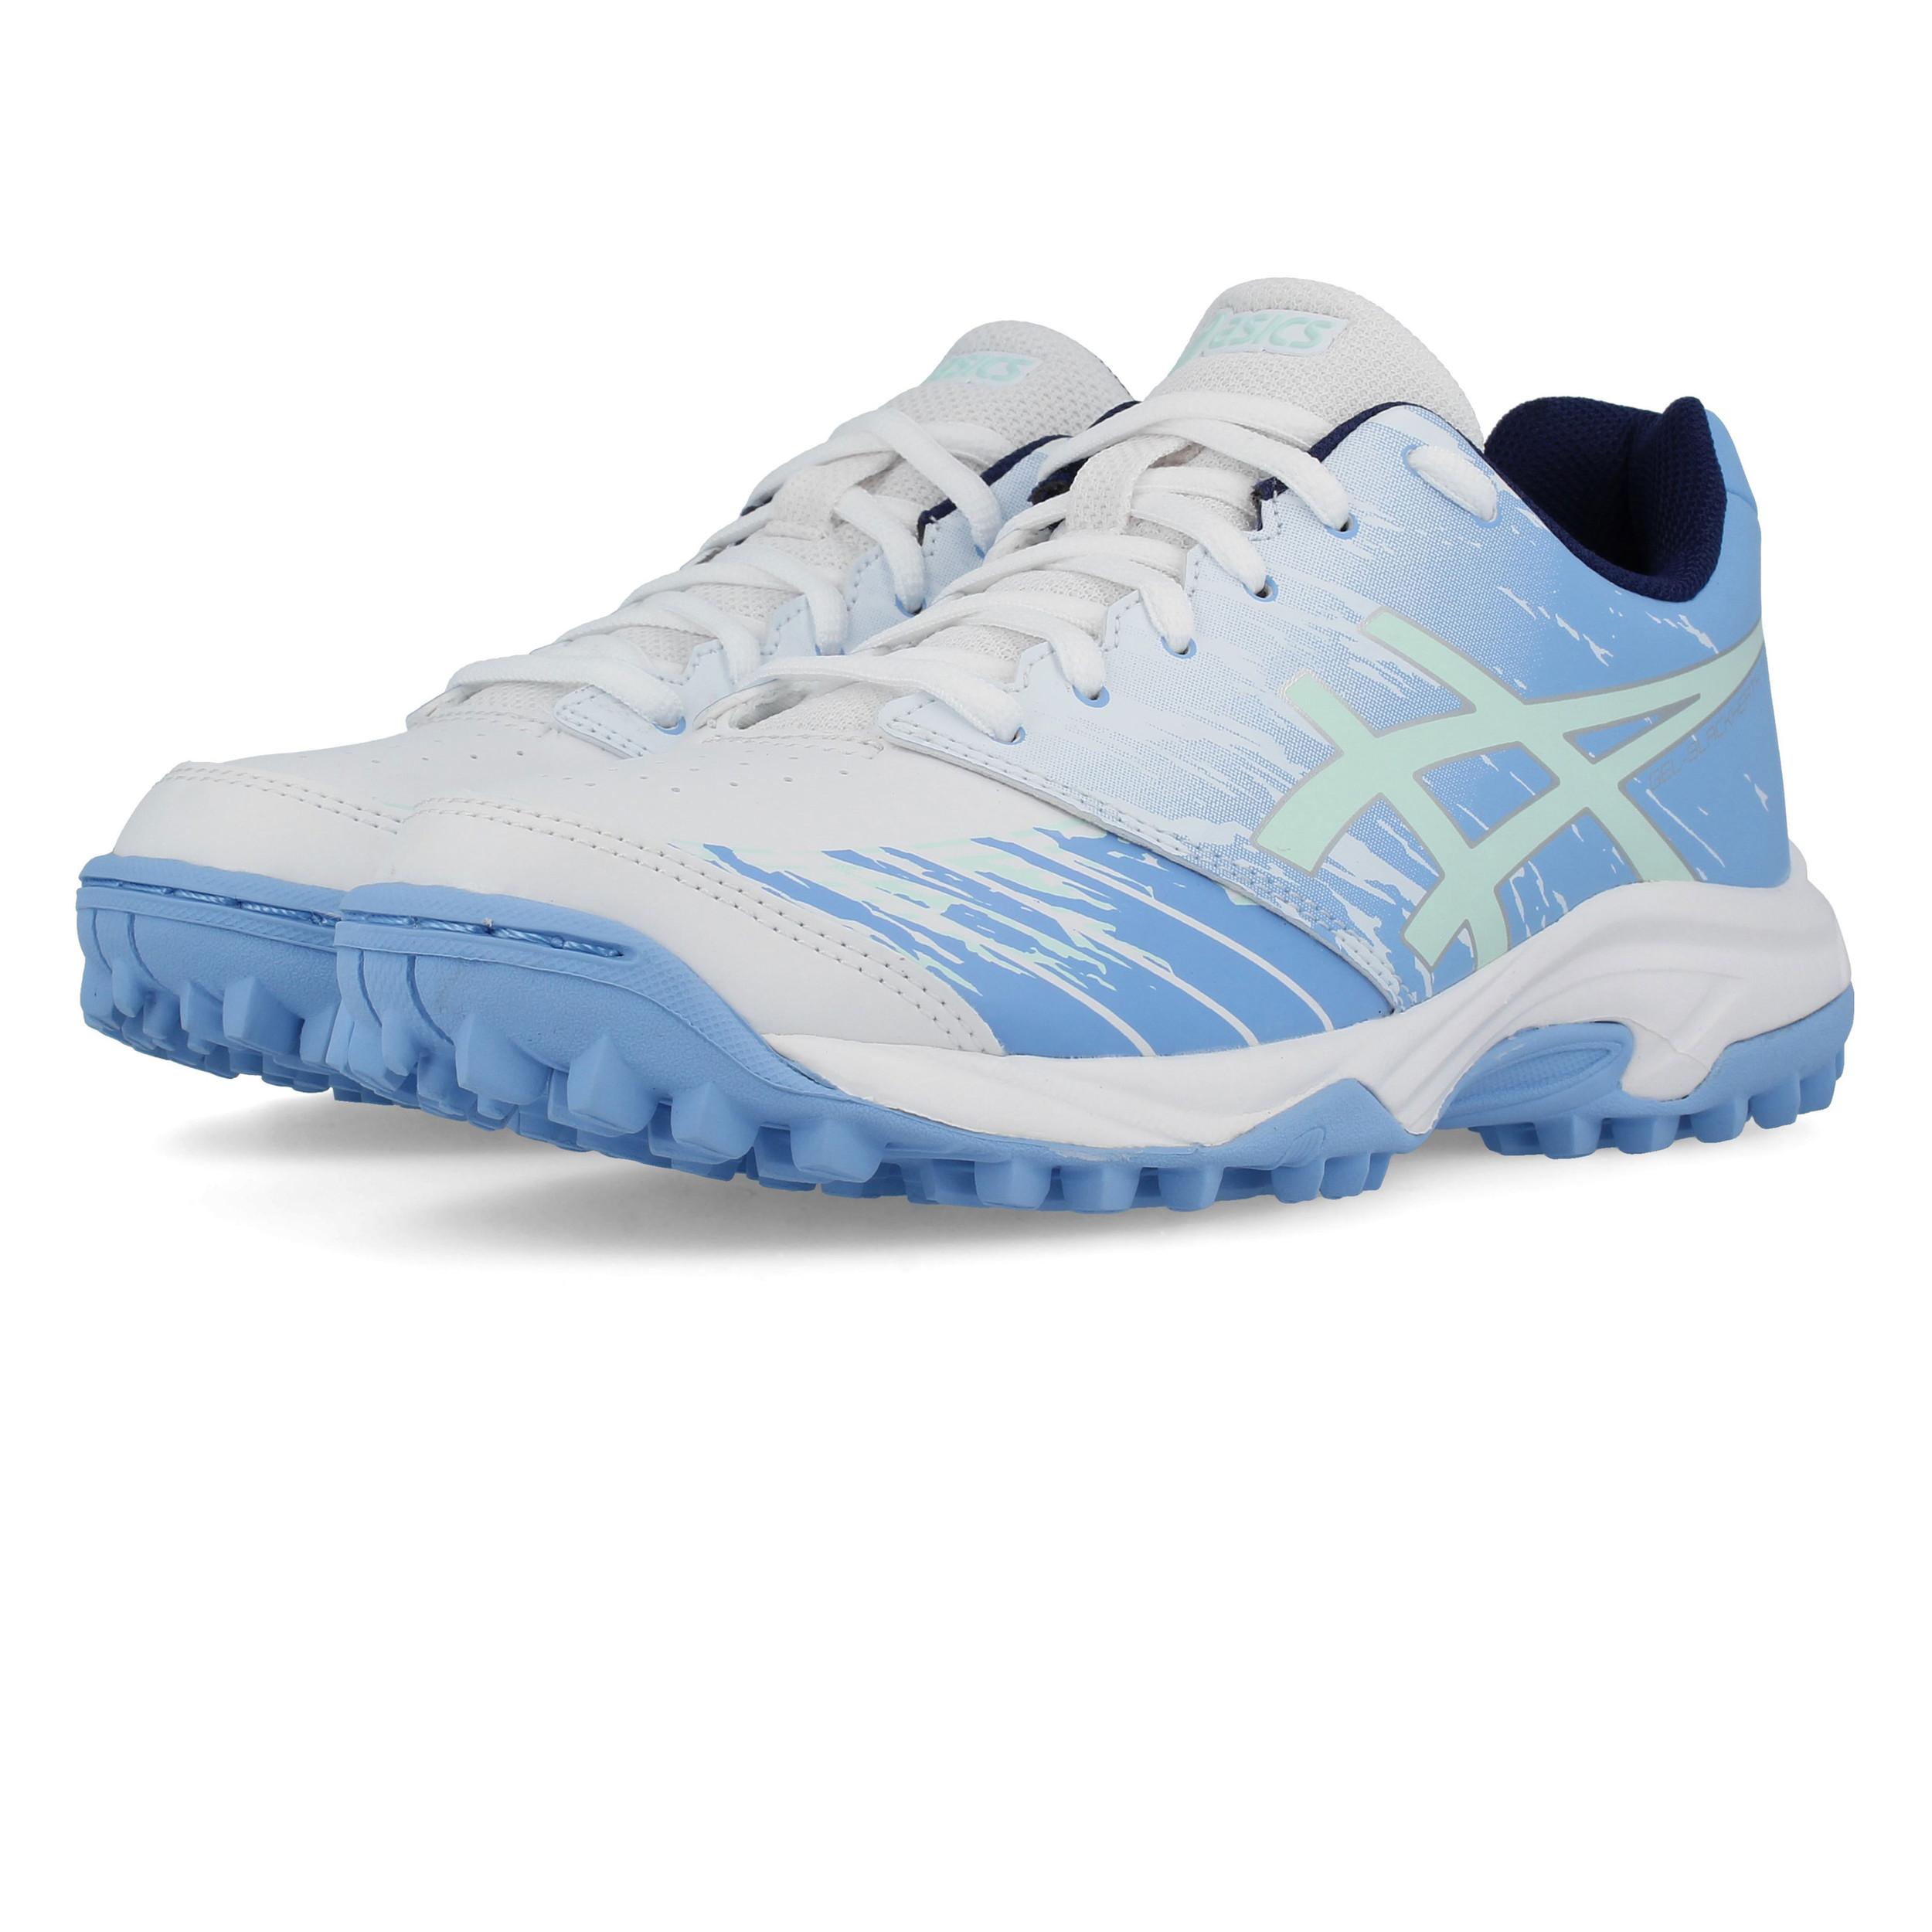 2f8711cc7e Asics Junior Gel-Blackheath 7 GS Hockey Shoes Pitch Field Blue White  Trainers